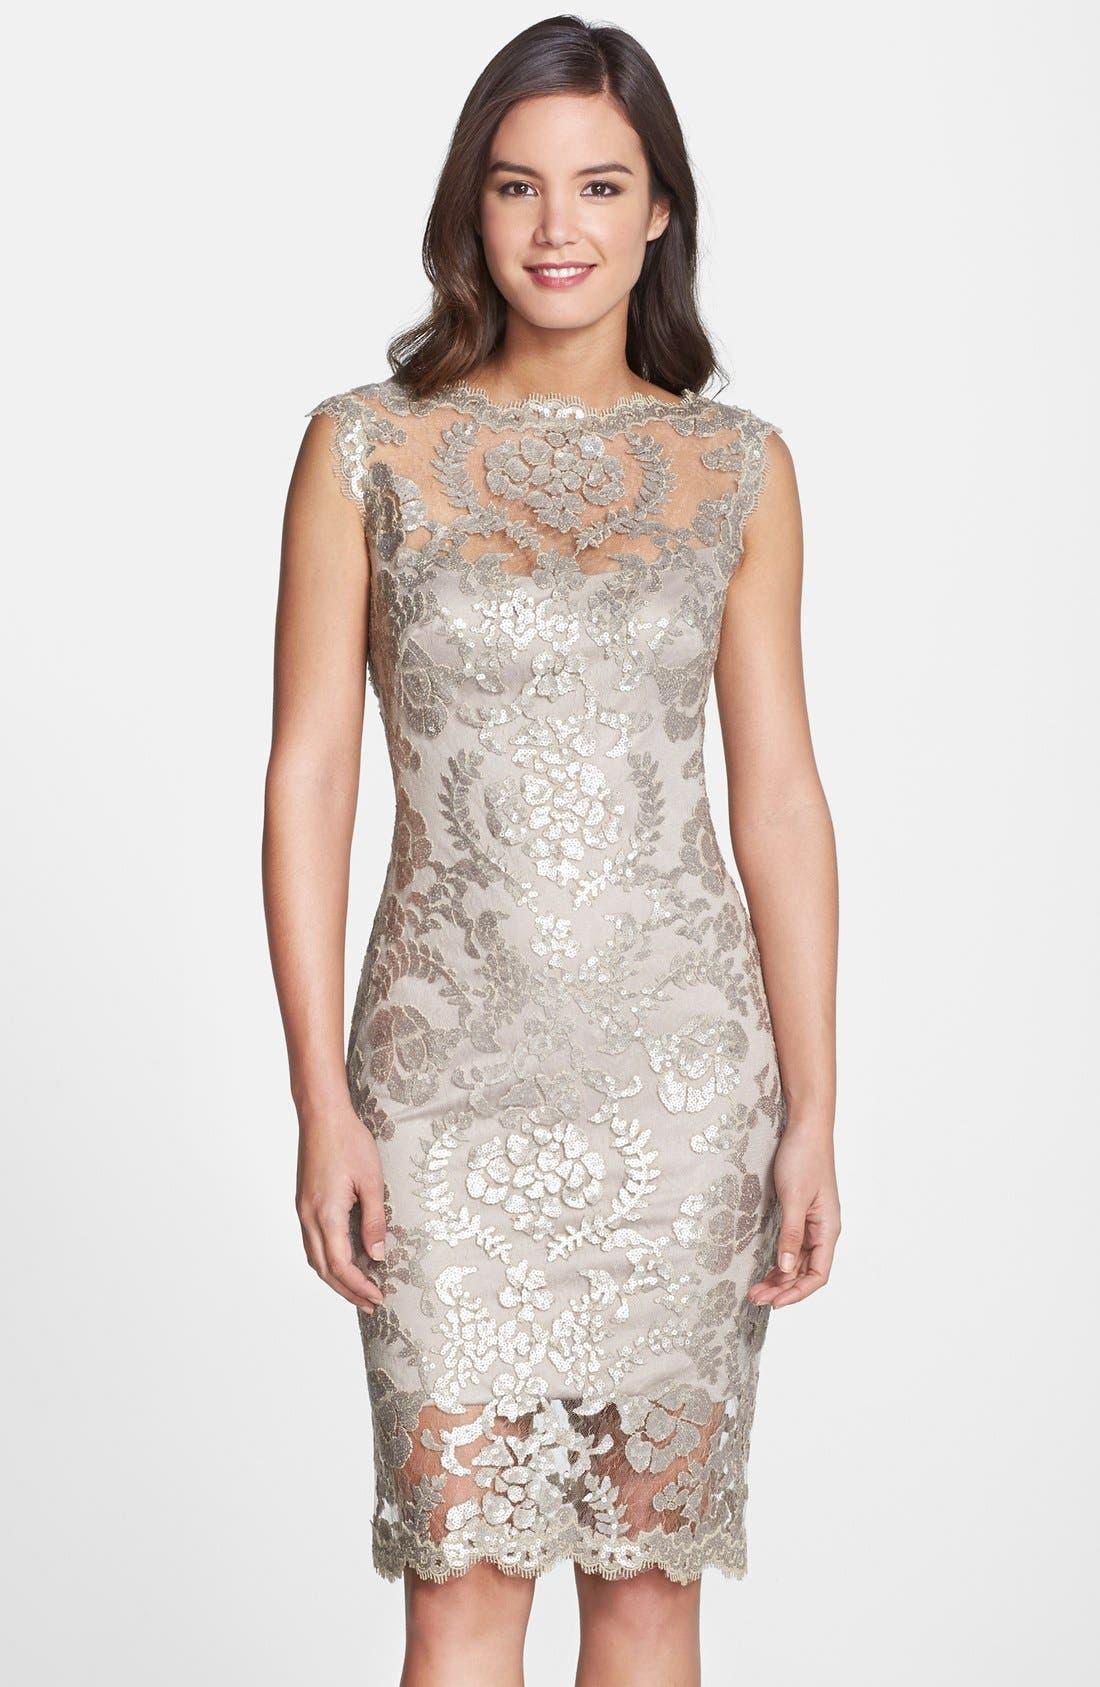 Alternate Image 1 Selected - Tadashi Shoji Sequin Illusion Lace Dress (Regular & Petite)